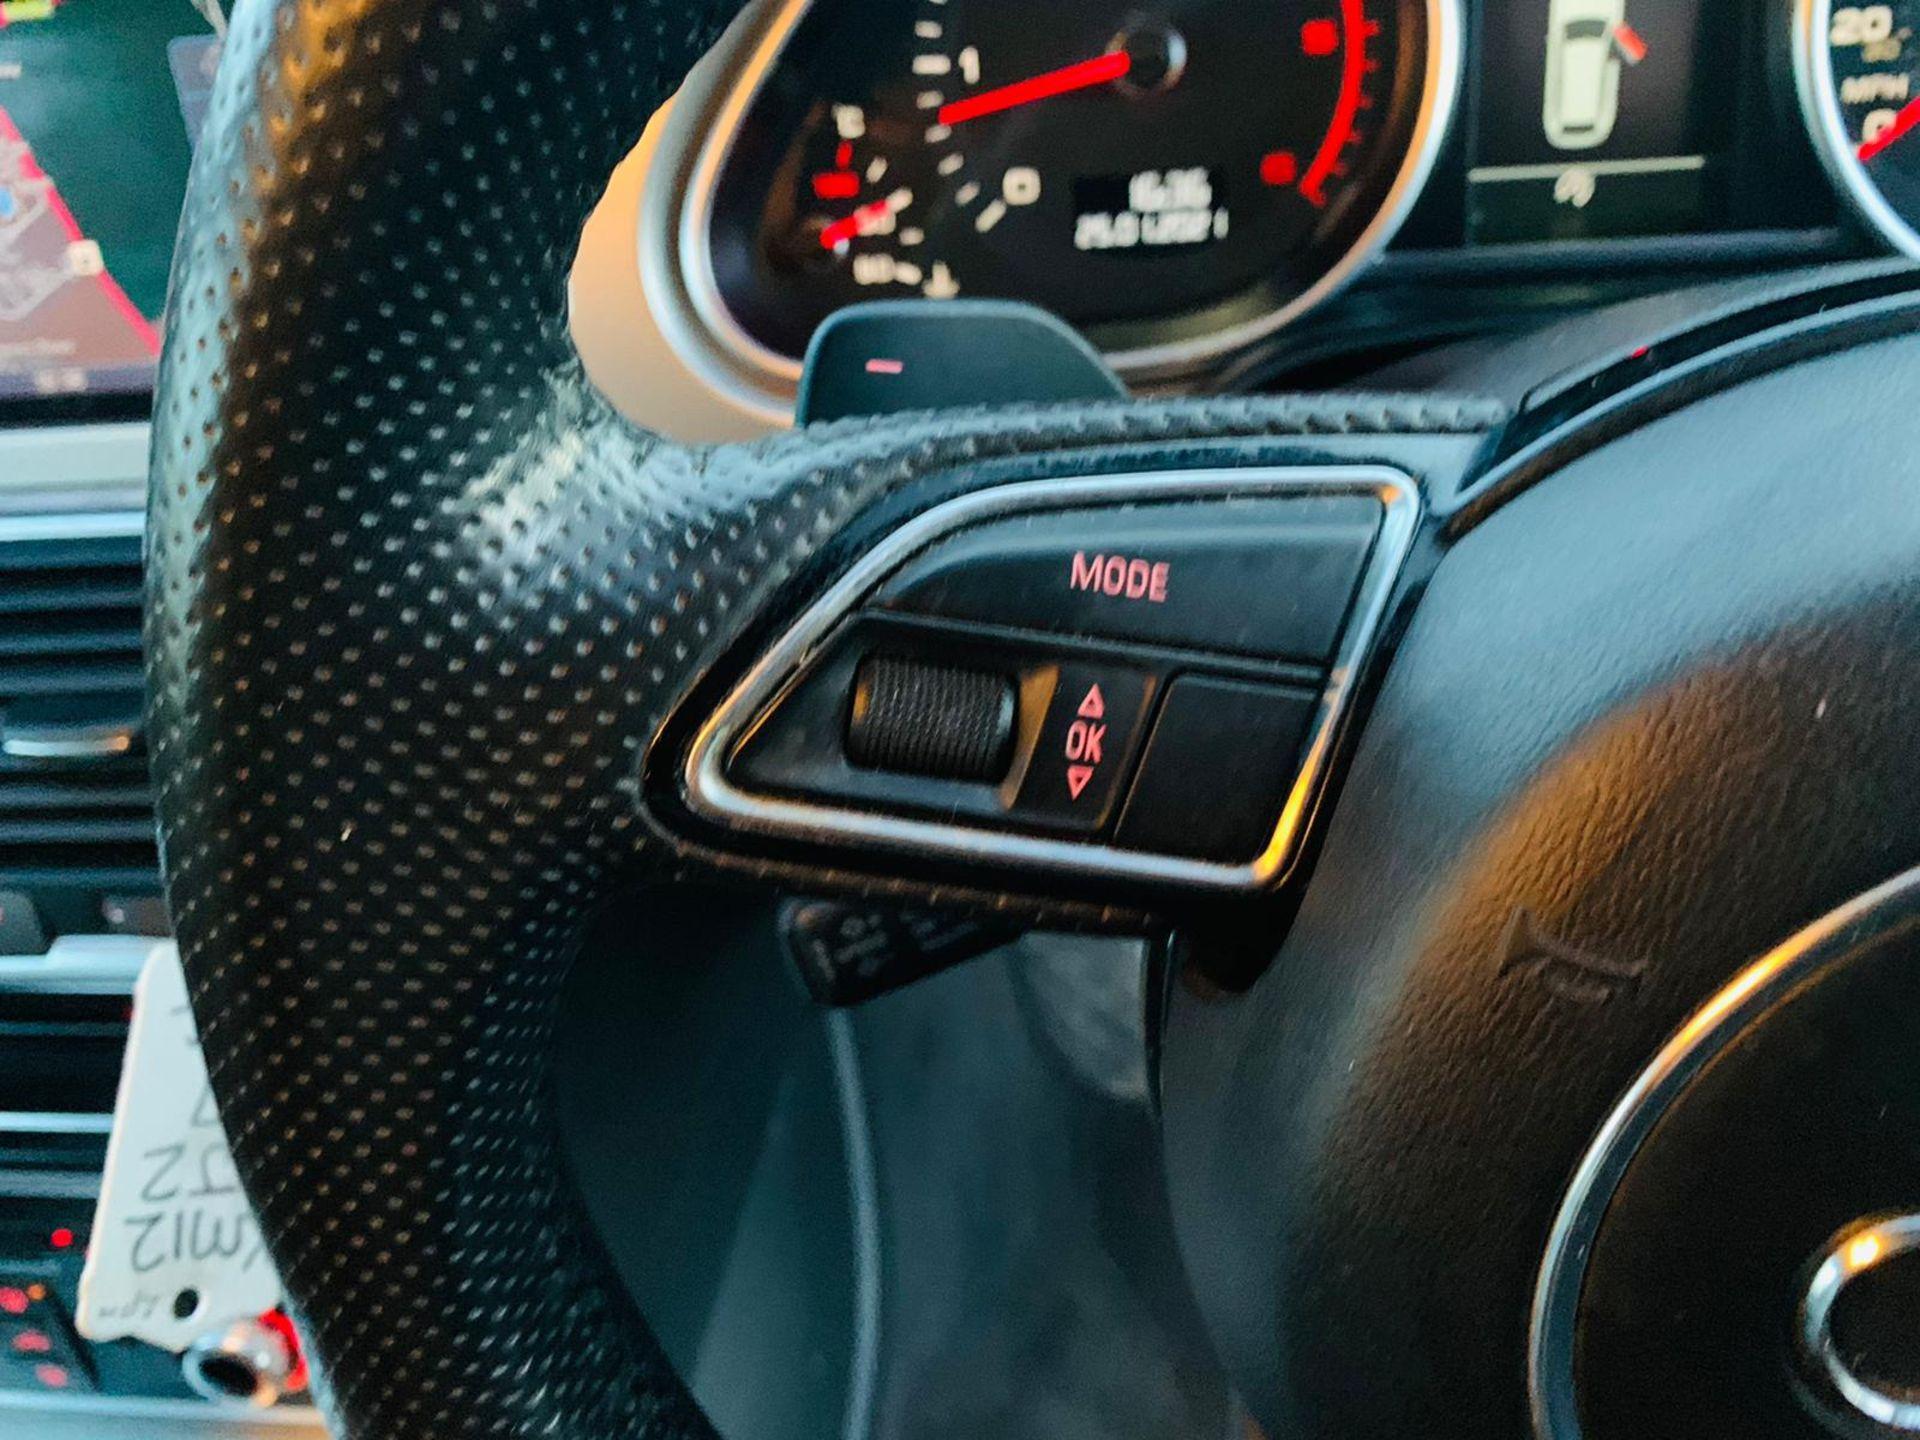 (Reserve Met)Audi Q7 3.0 TDI Quattro S Line Plus Auto (7 Seats) - 12 Reg - Only 63k Miles -Sat Nav- - Image 23 of 37